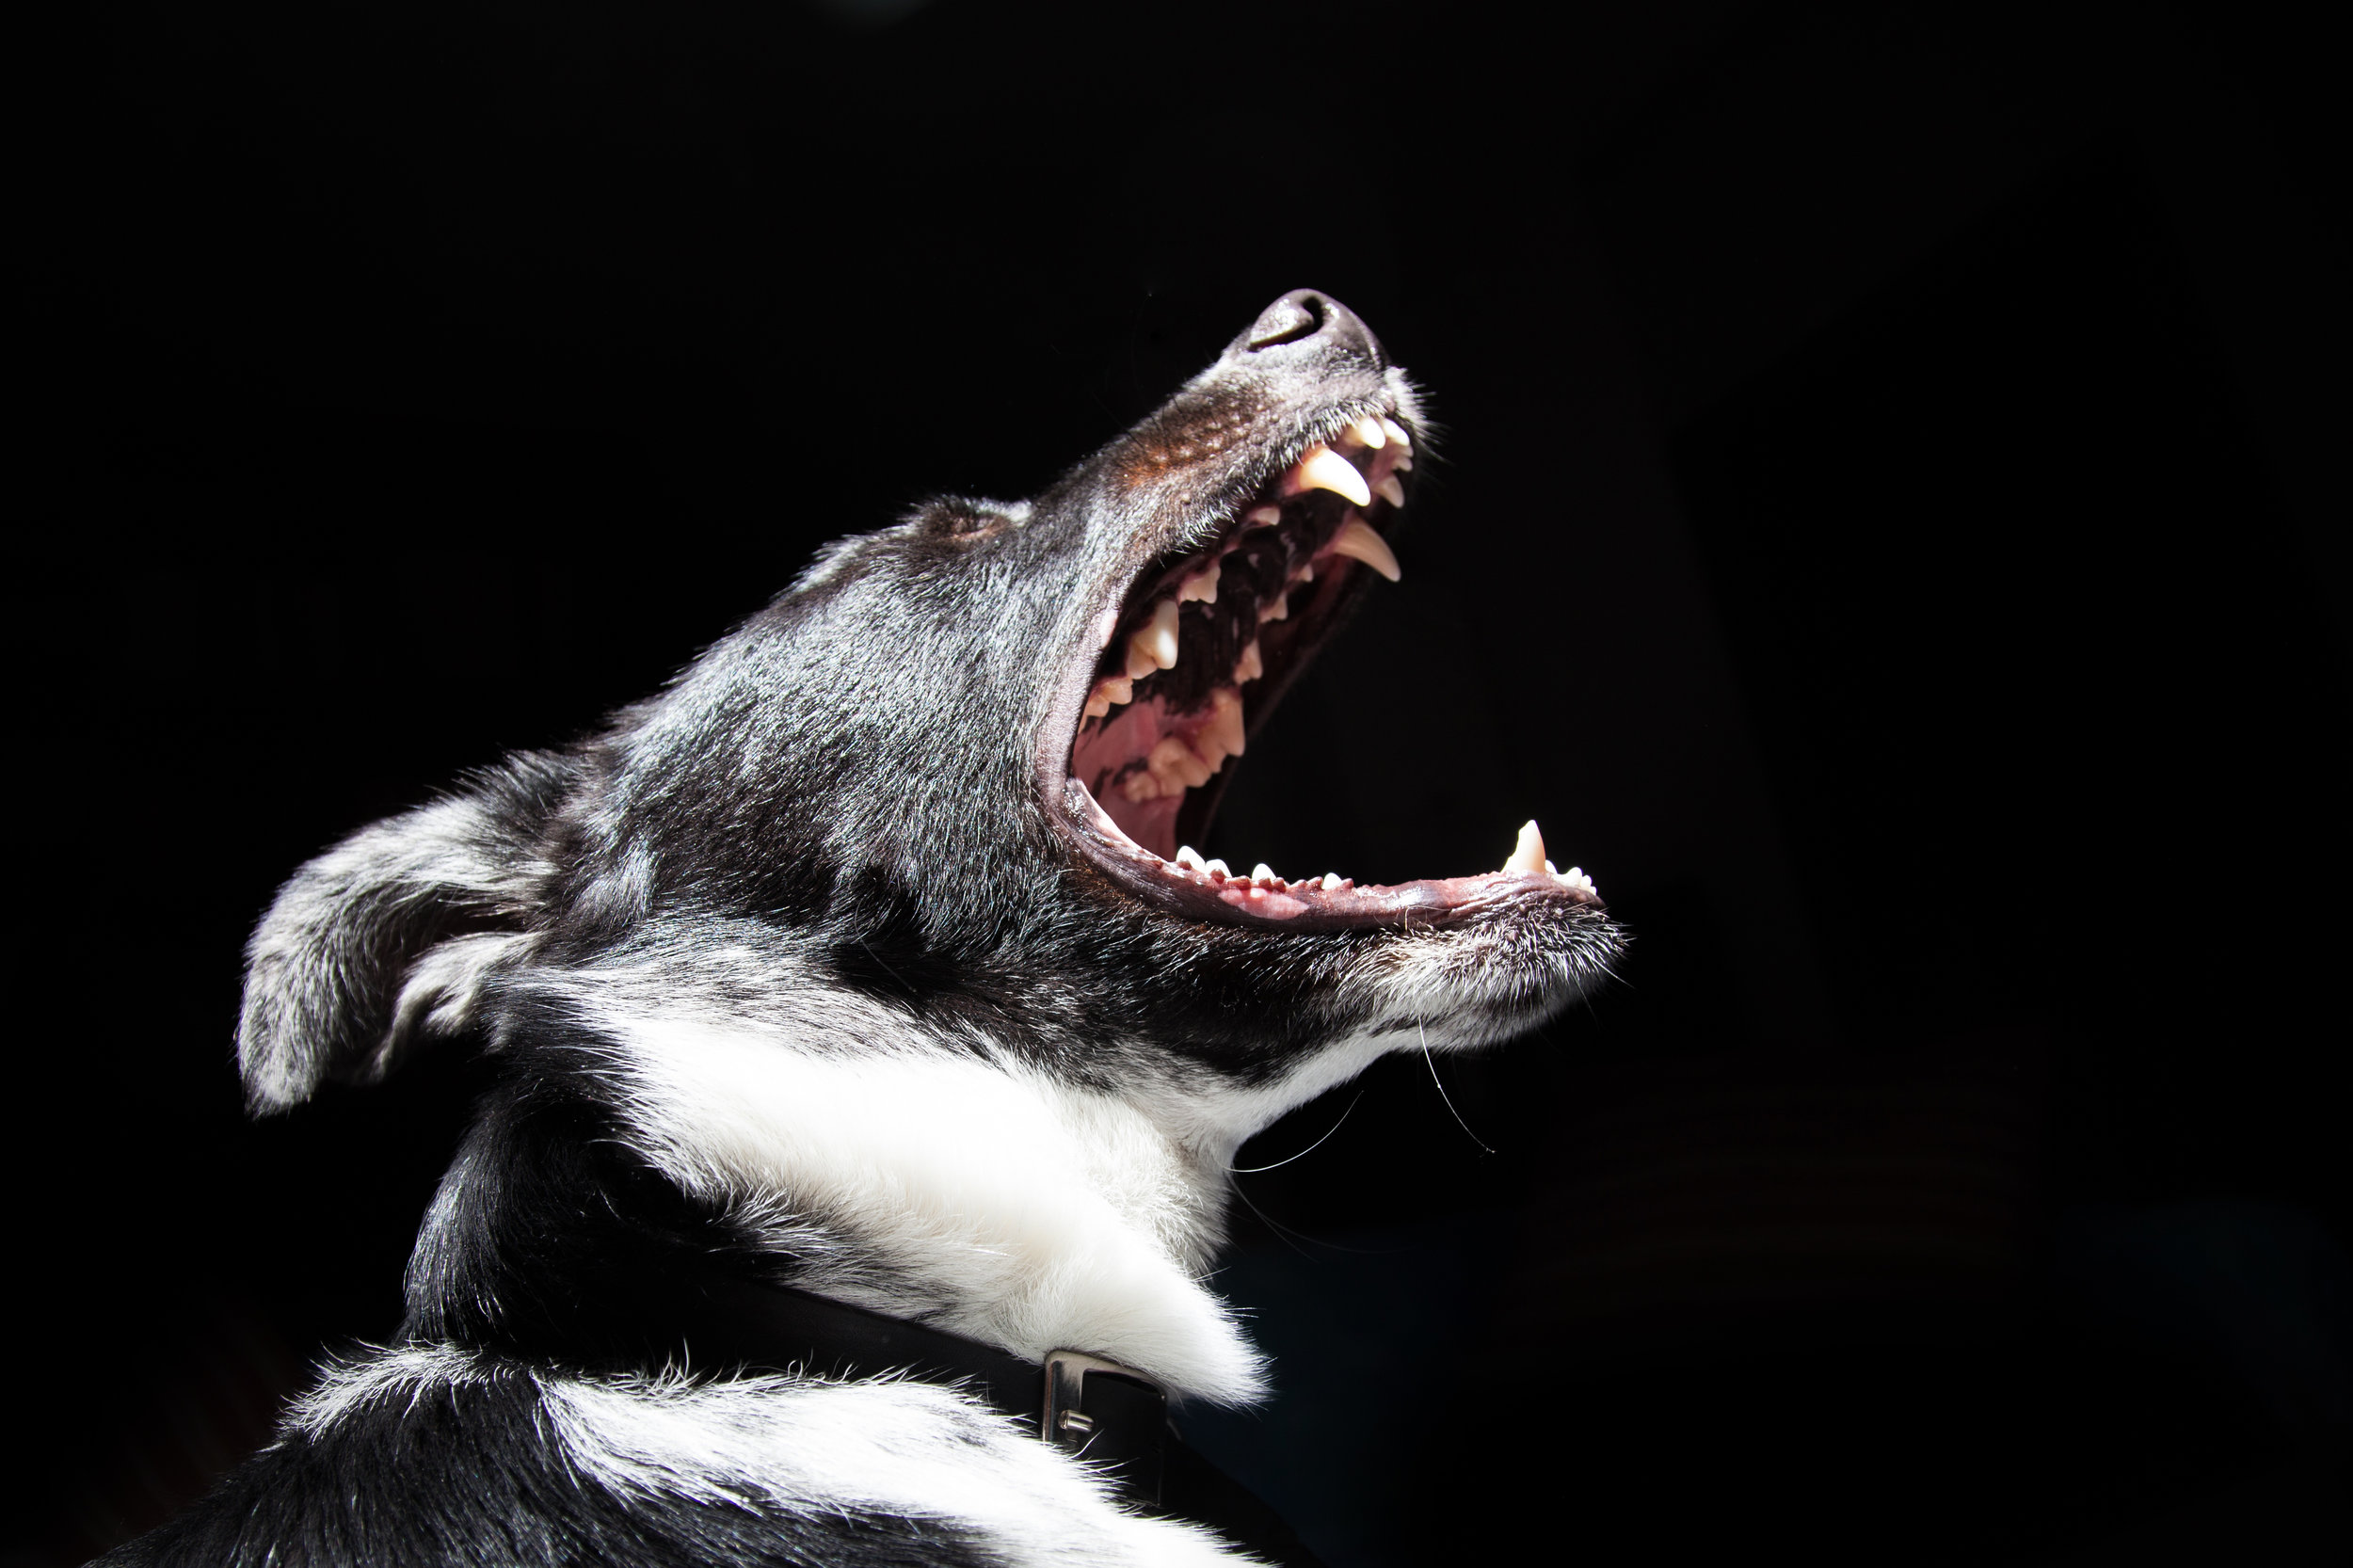 aggressivedogpic.jpg